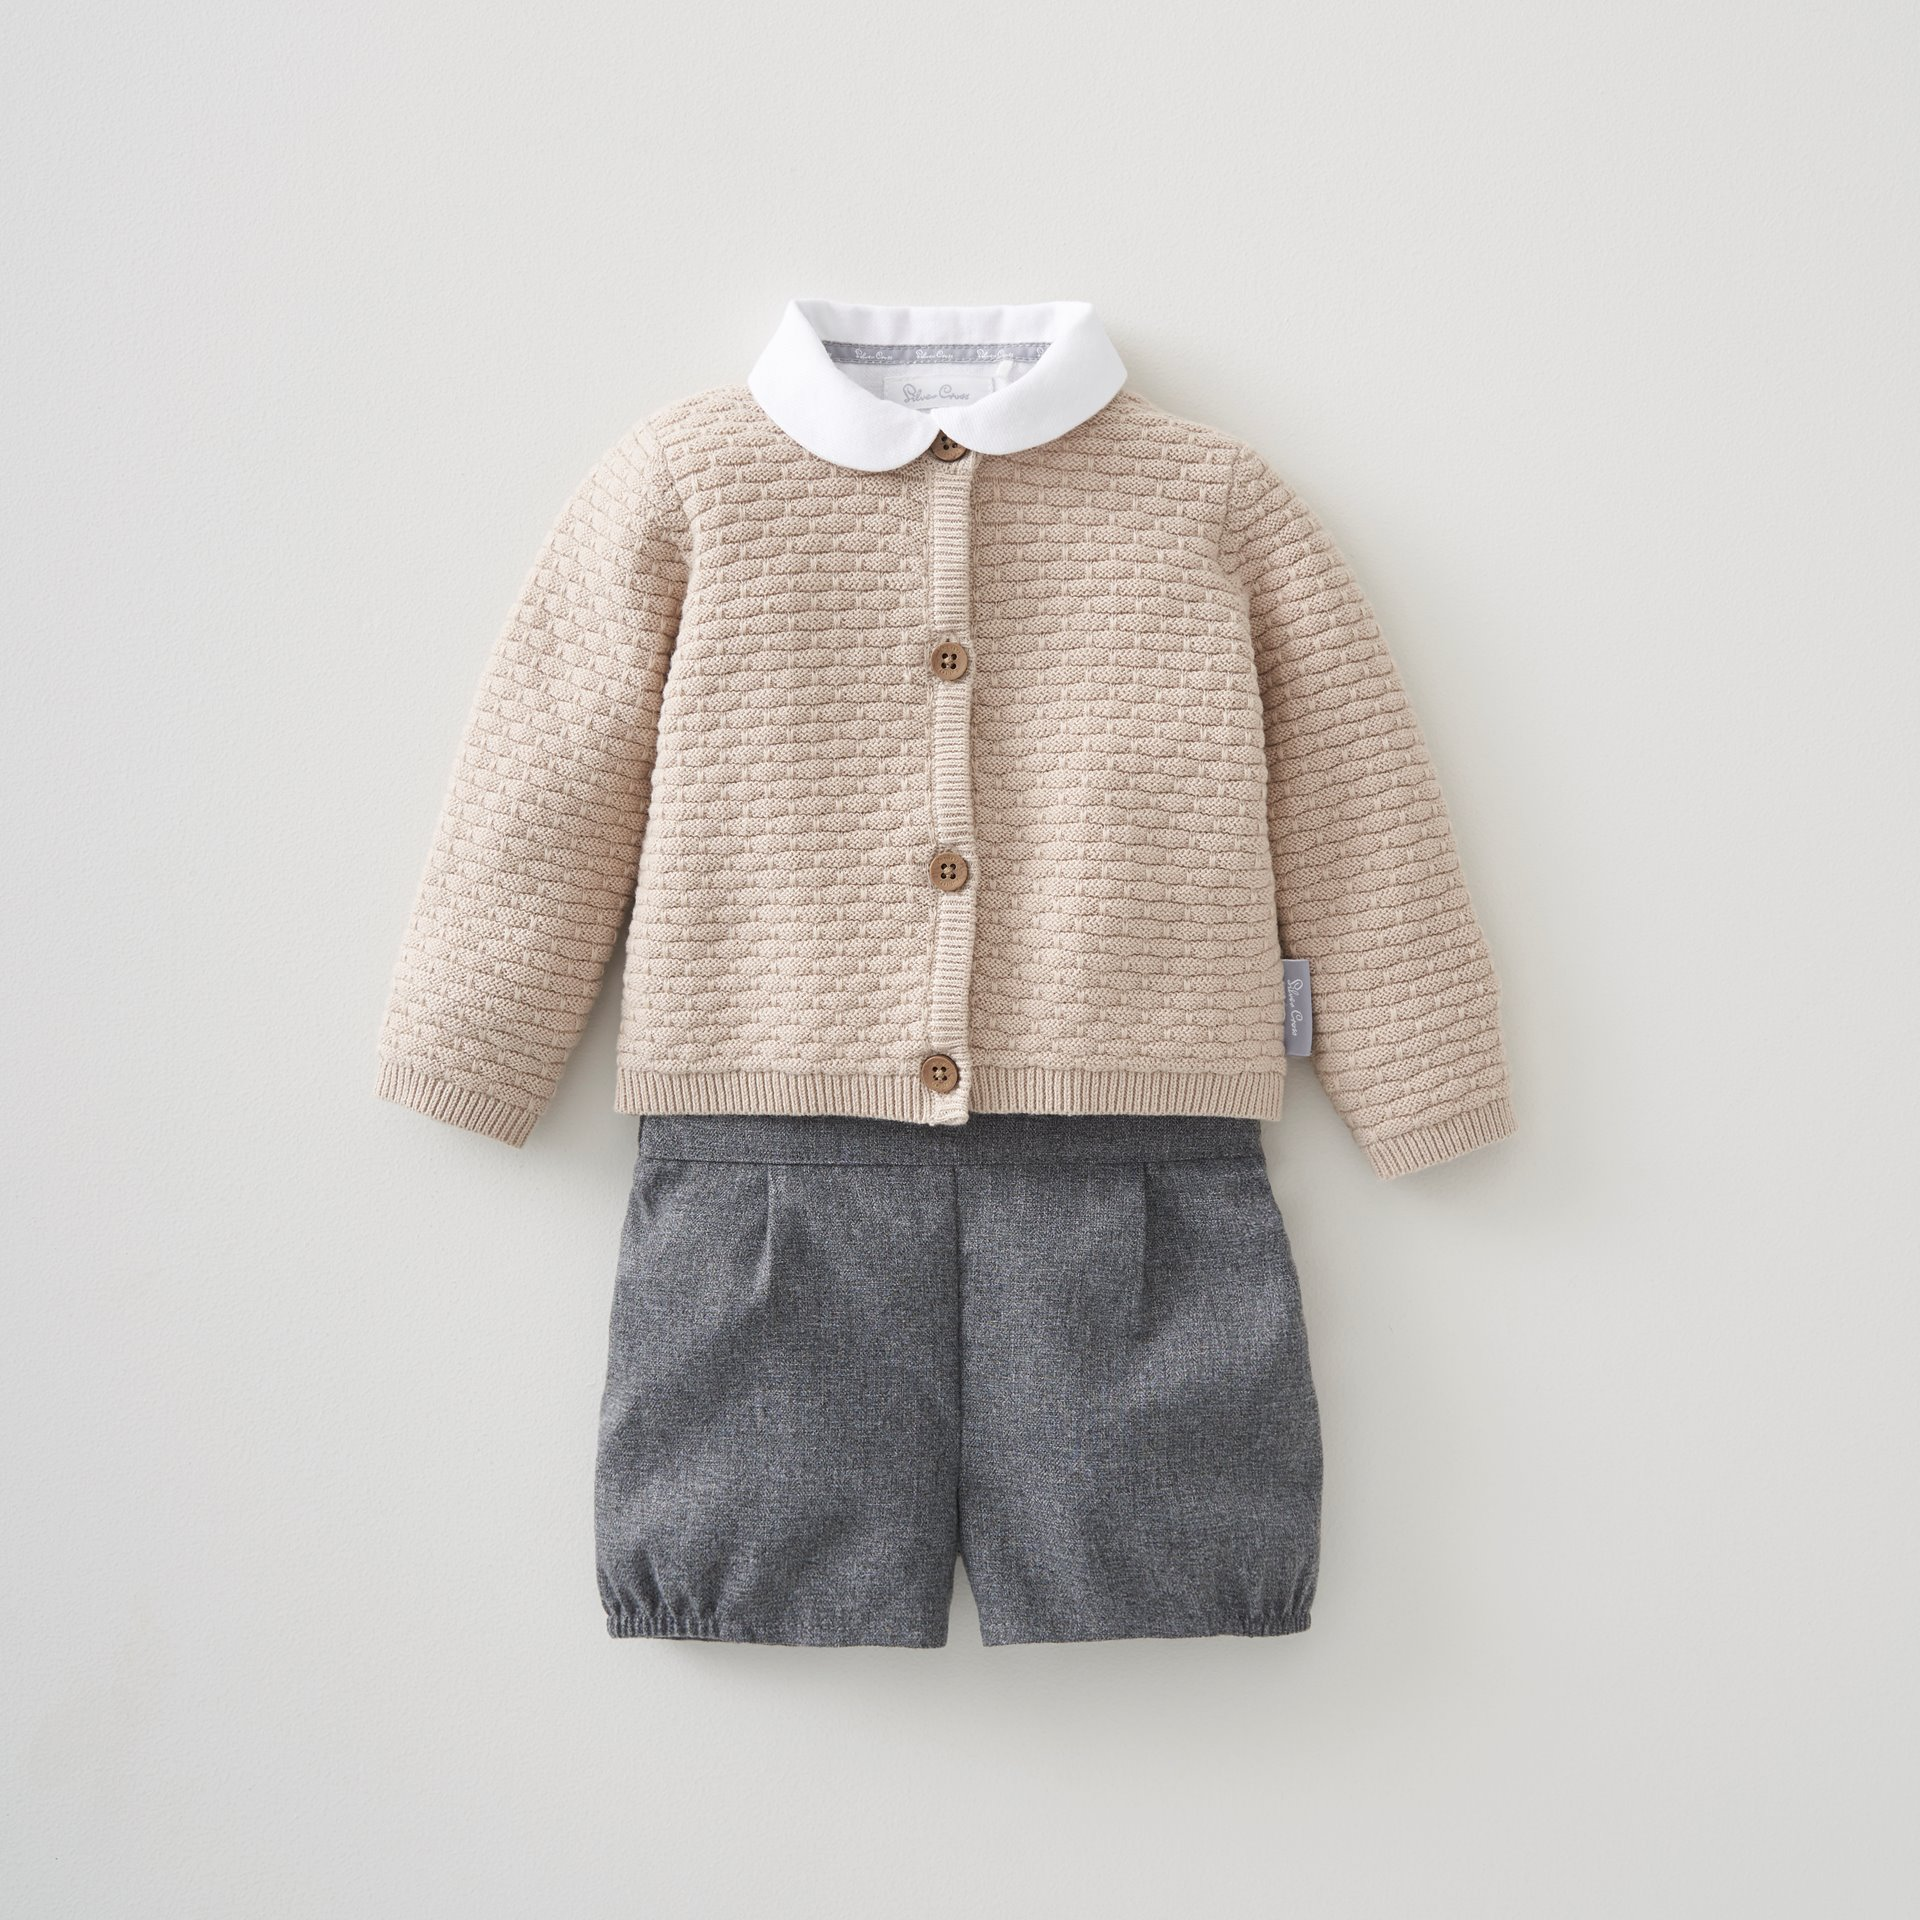 Unisex 3 Pce Knit Cardi / Bloomer & Shirt Set 3-6 Months